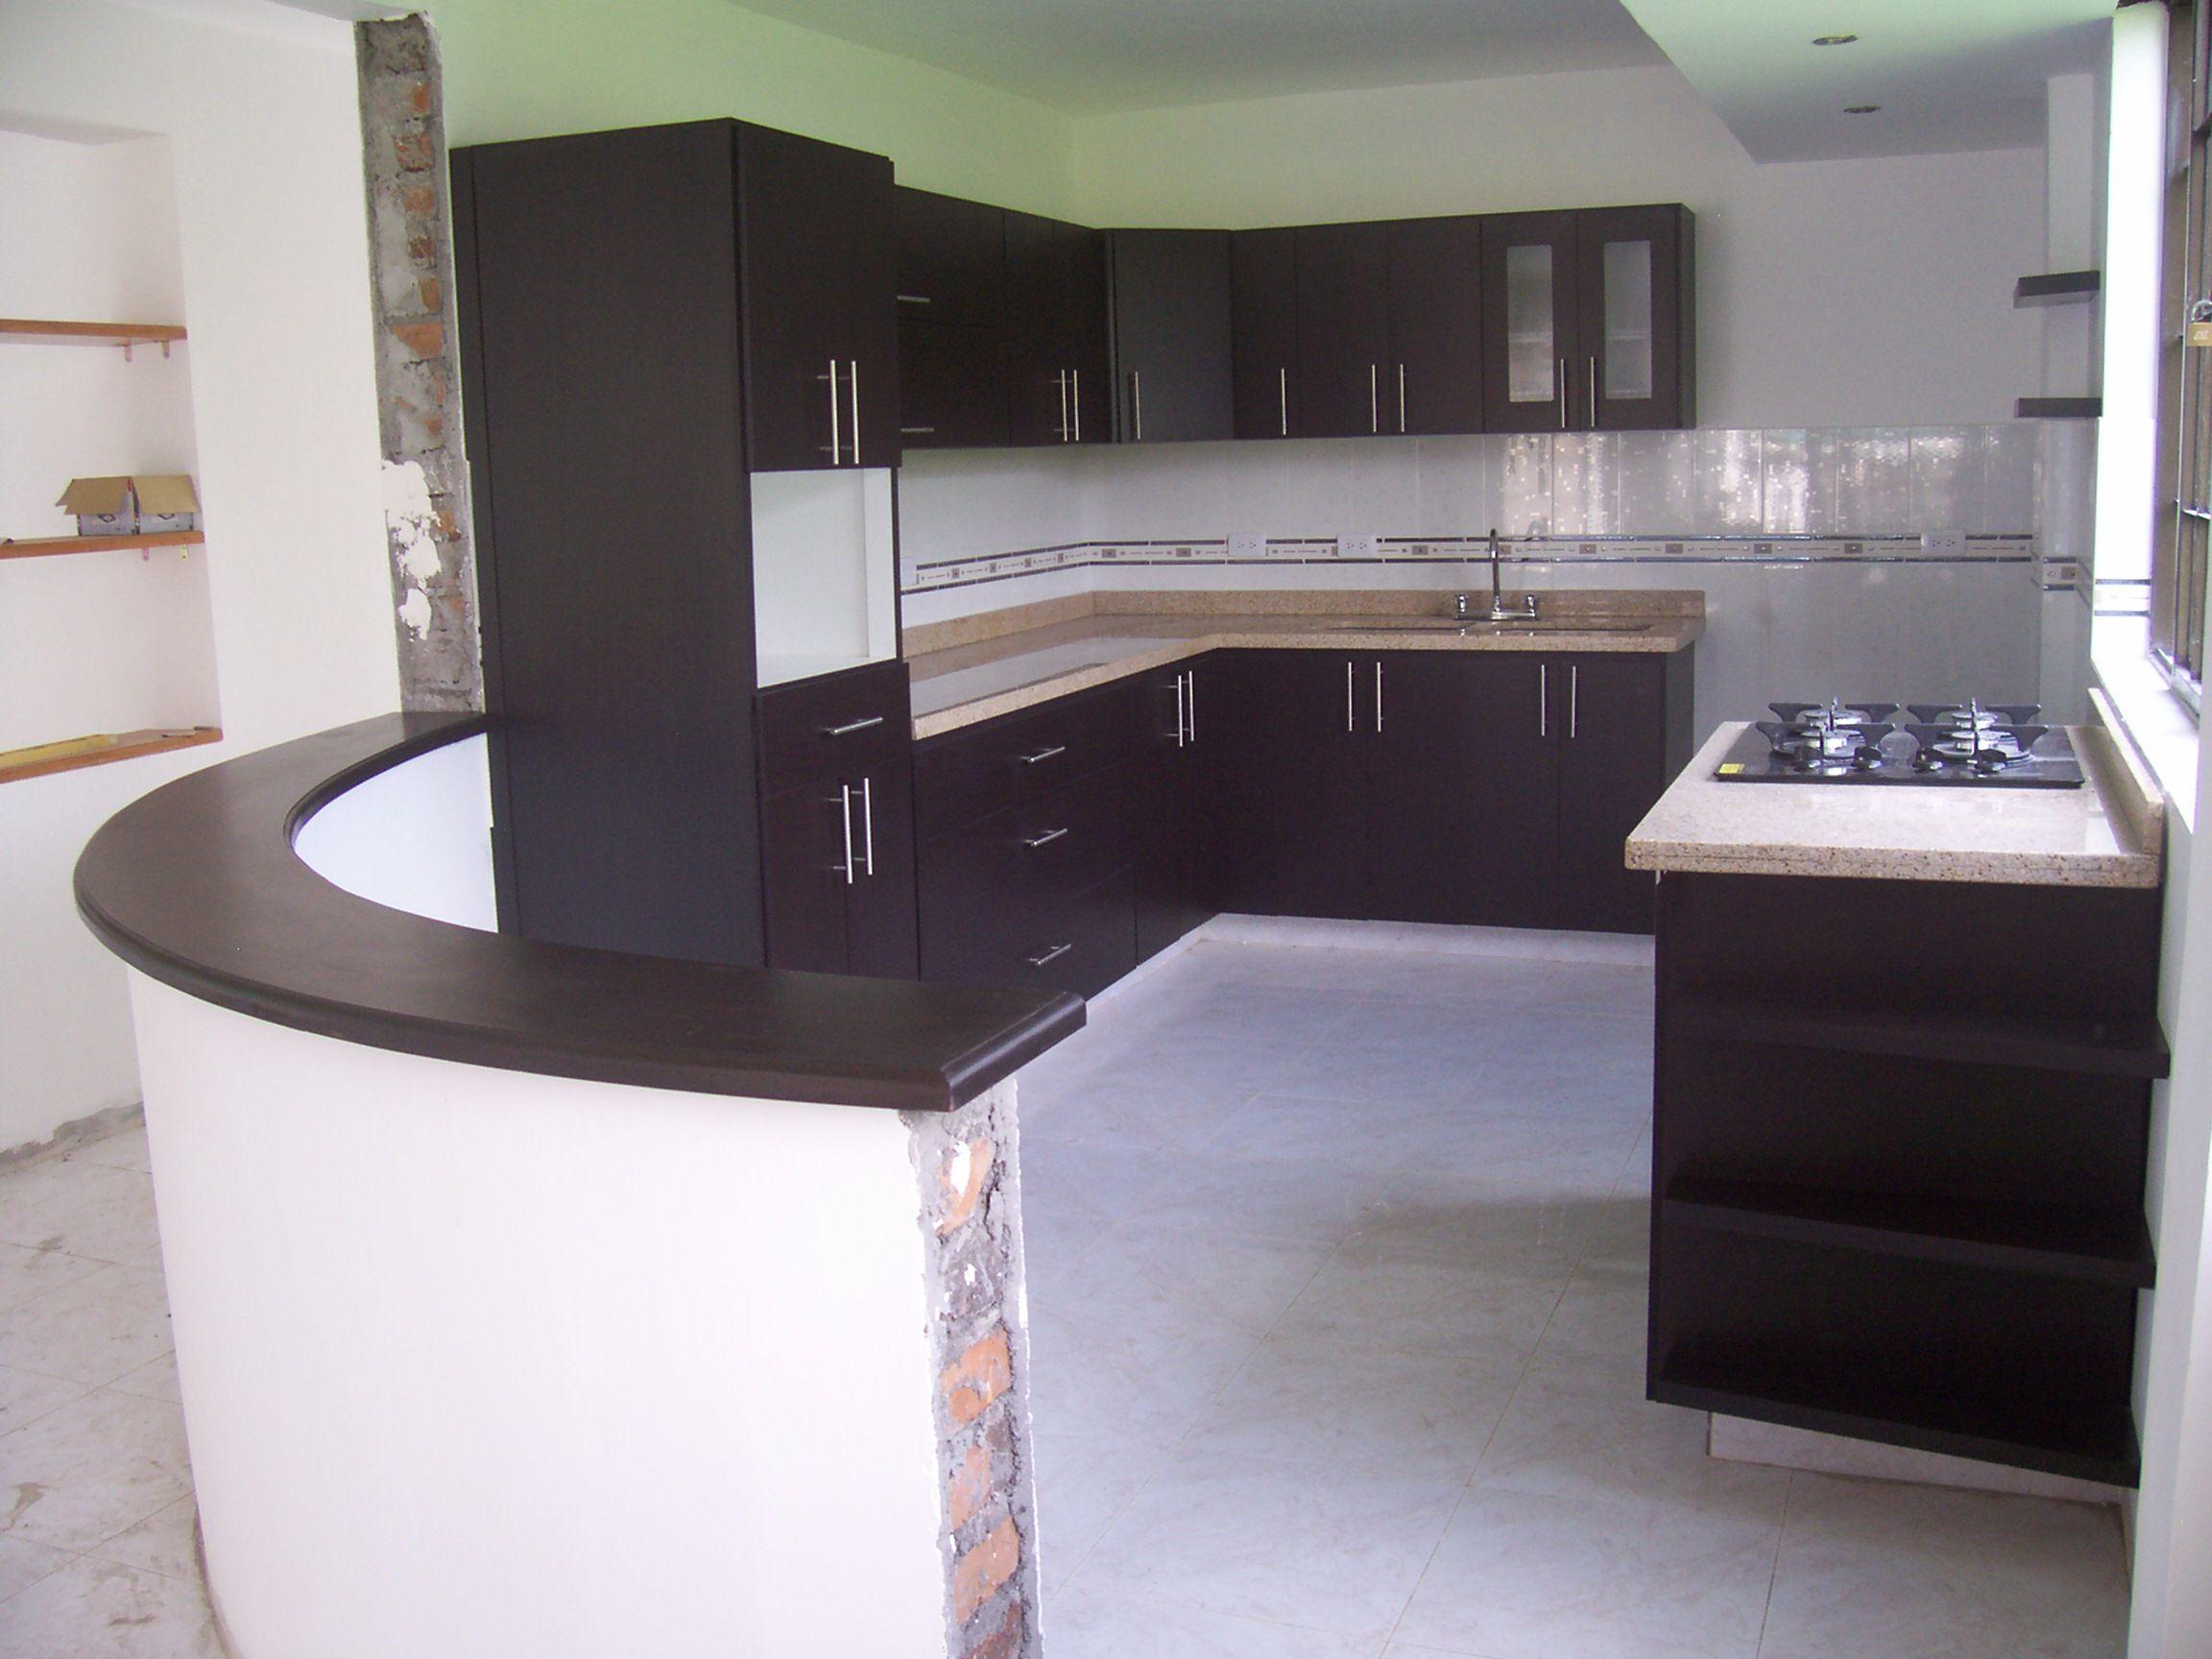 Pereira fabricada por c g arte y decoraci n cocina con for Cocinas de granito